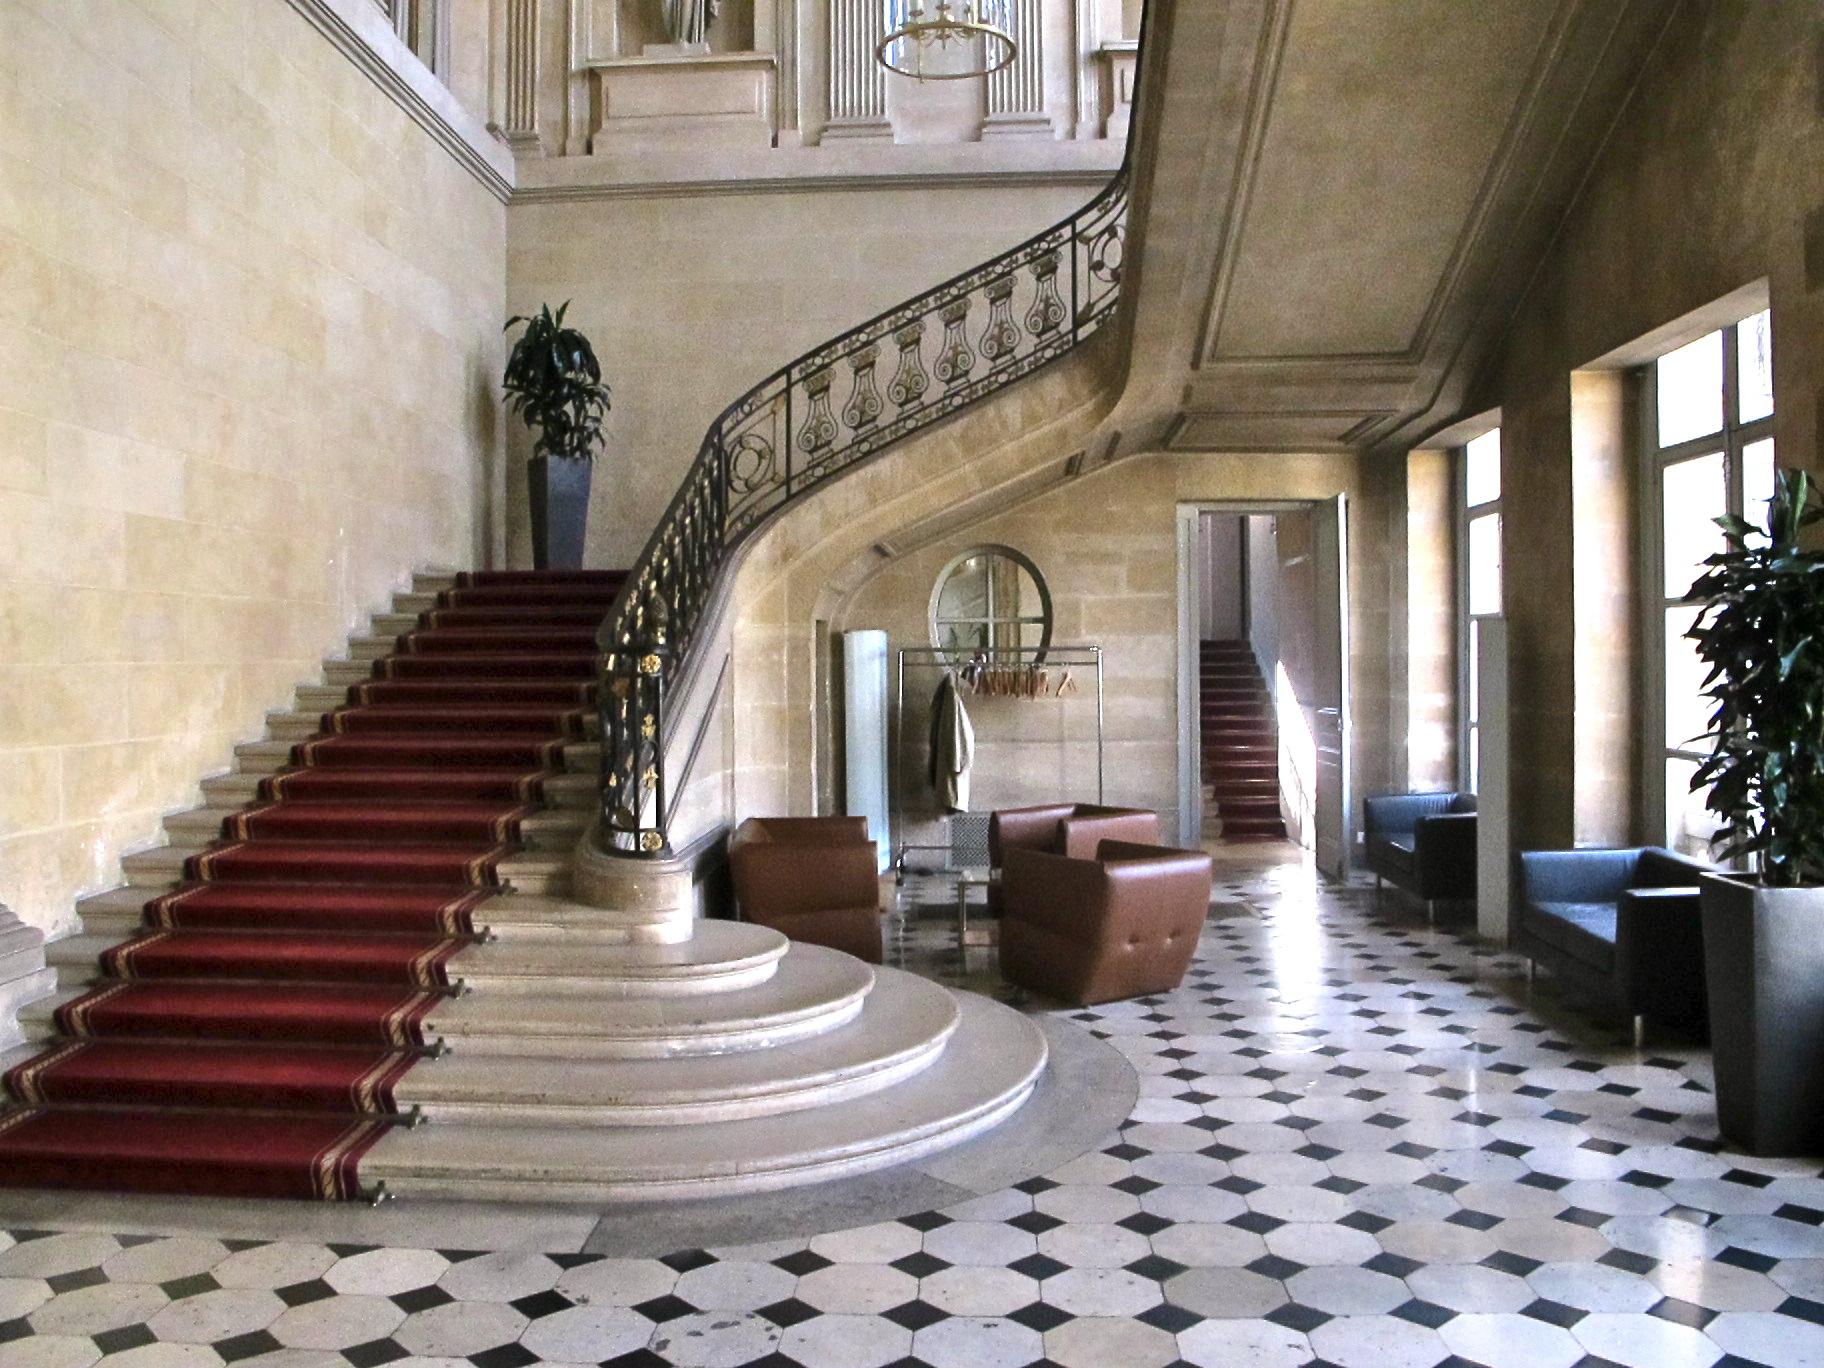 Hotel Beauvais Paris